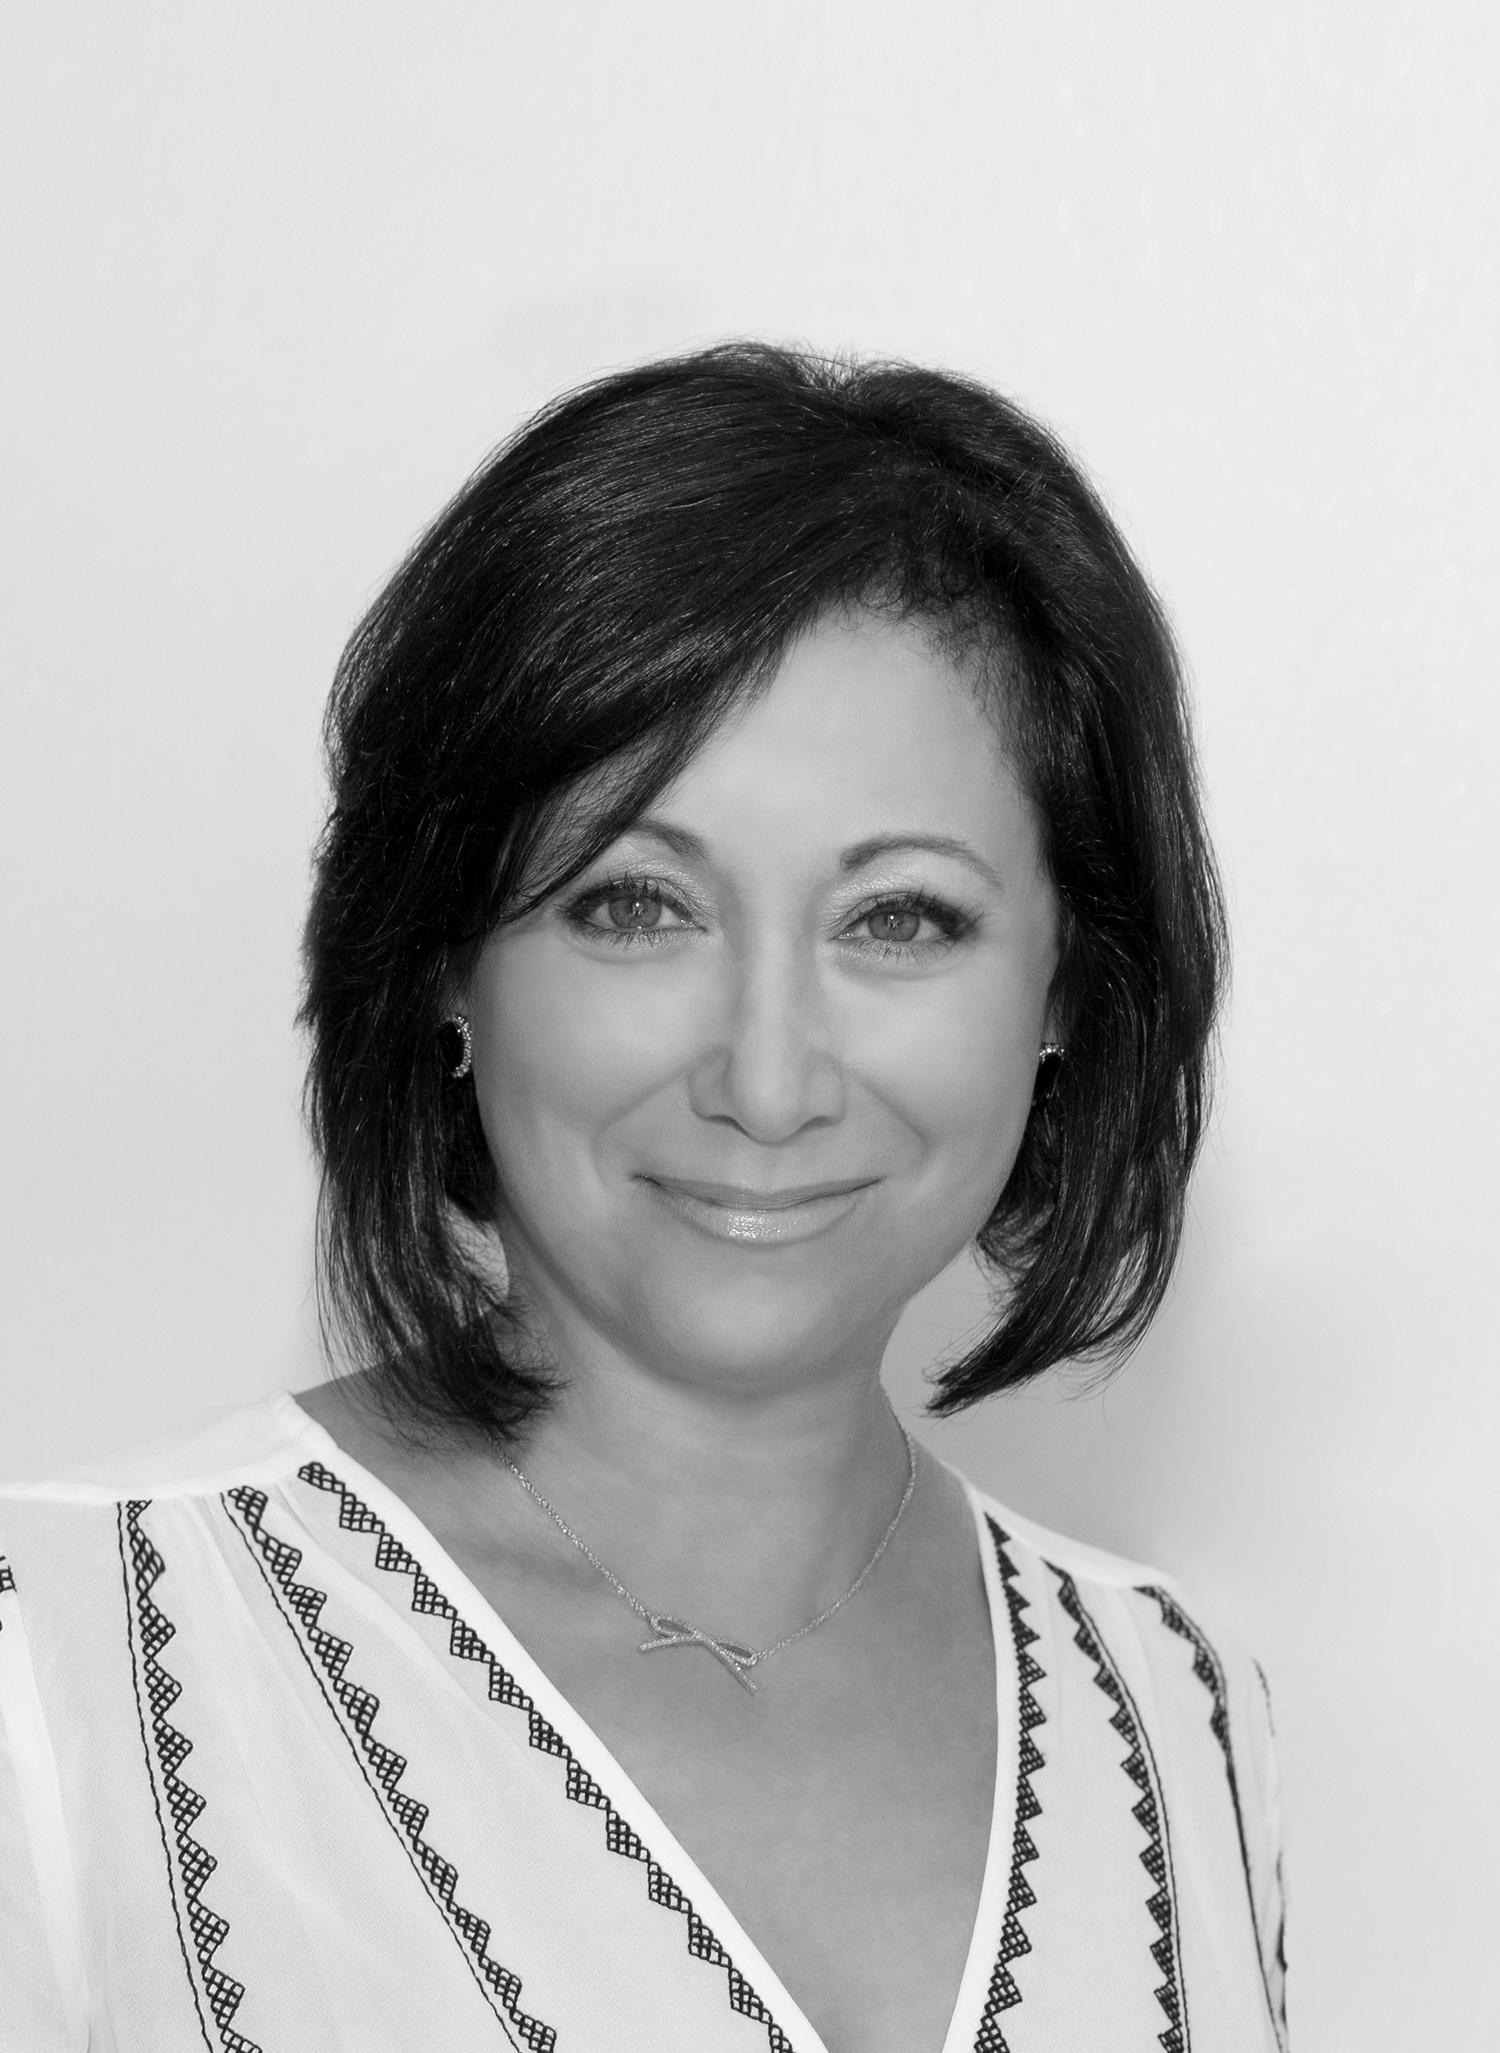 Sarah Sheridan